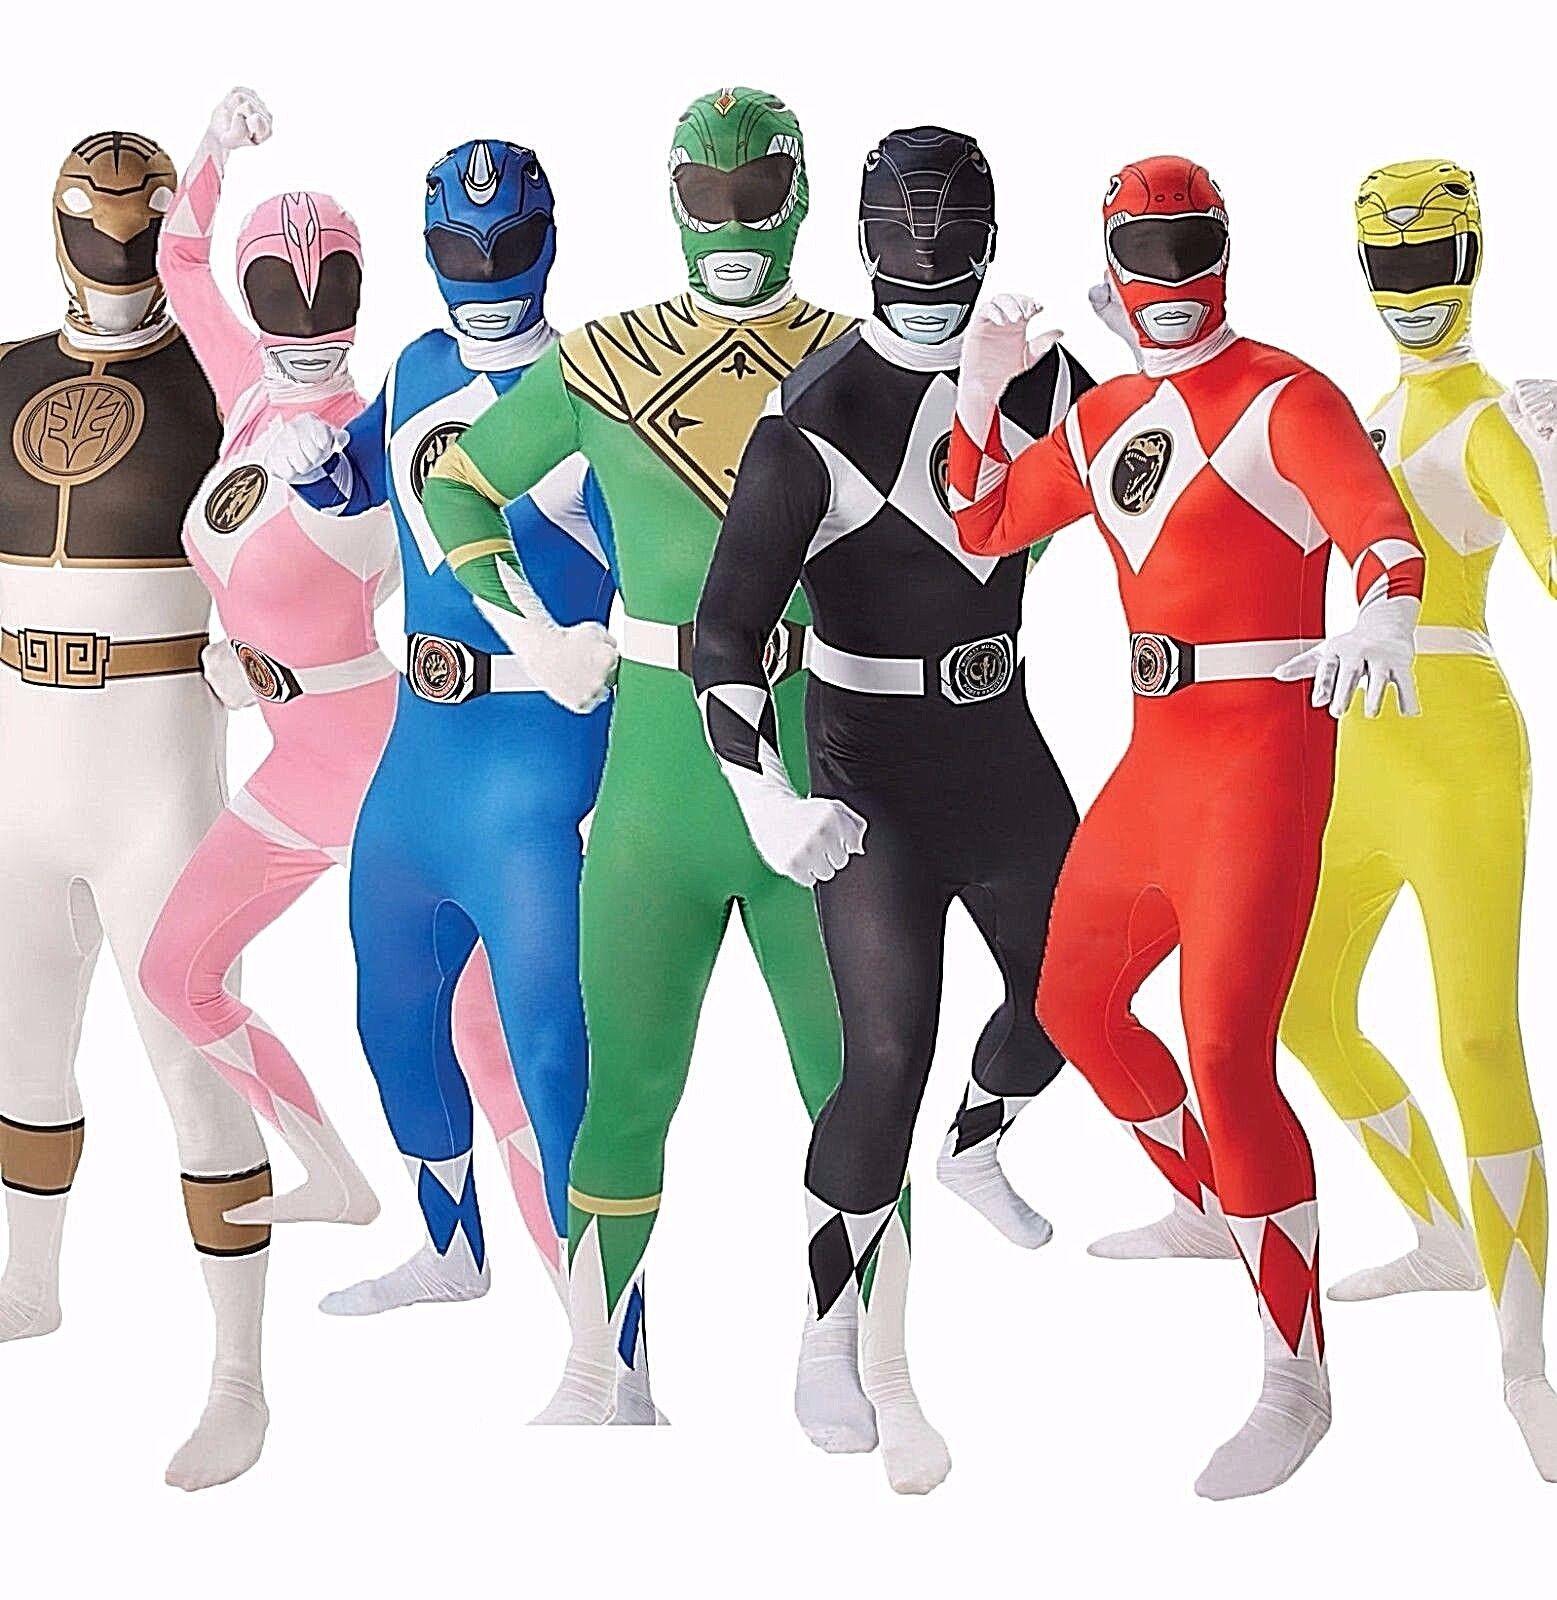 Adult Ladies PINK POWER RANGER Fancy Dress Costumes Superhero Rangers Outfit NEW